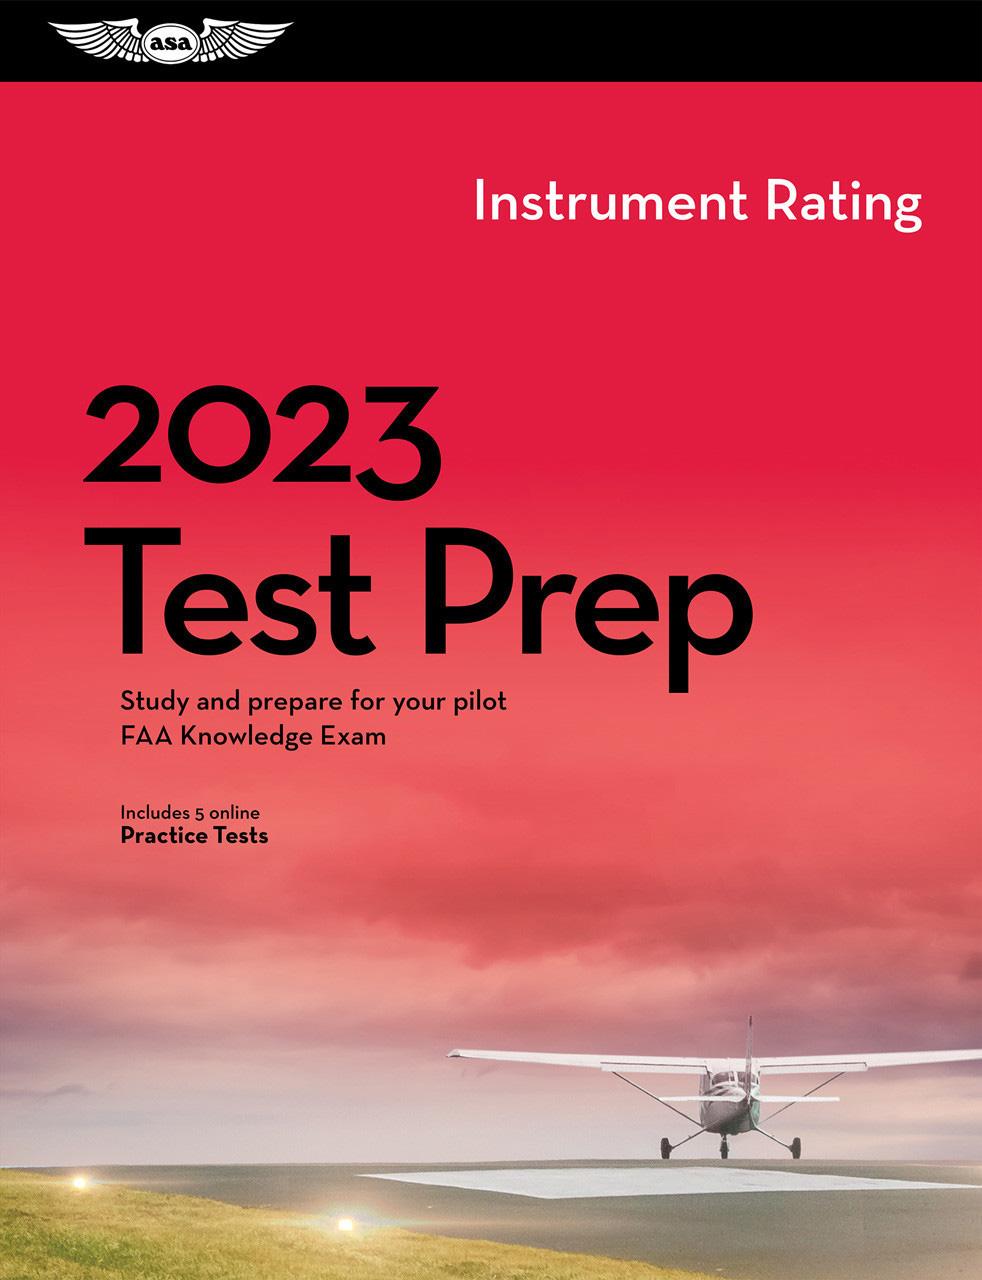 c41c61bbfb5 ASA Instrument Rating Test Prep Book - MyPilotStore.com